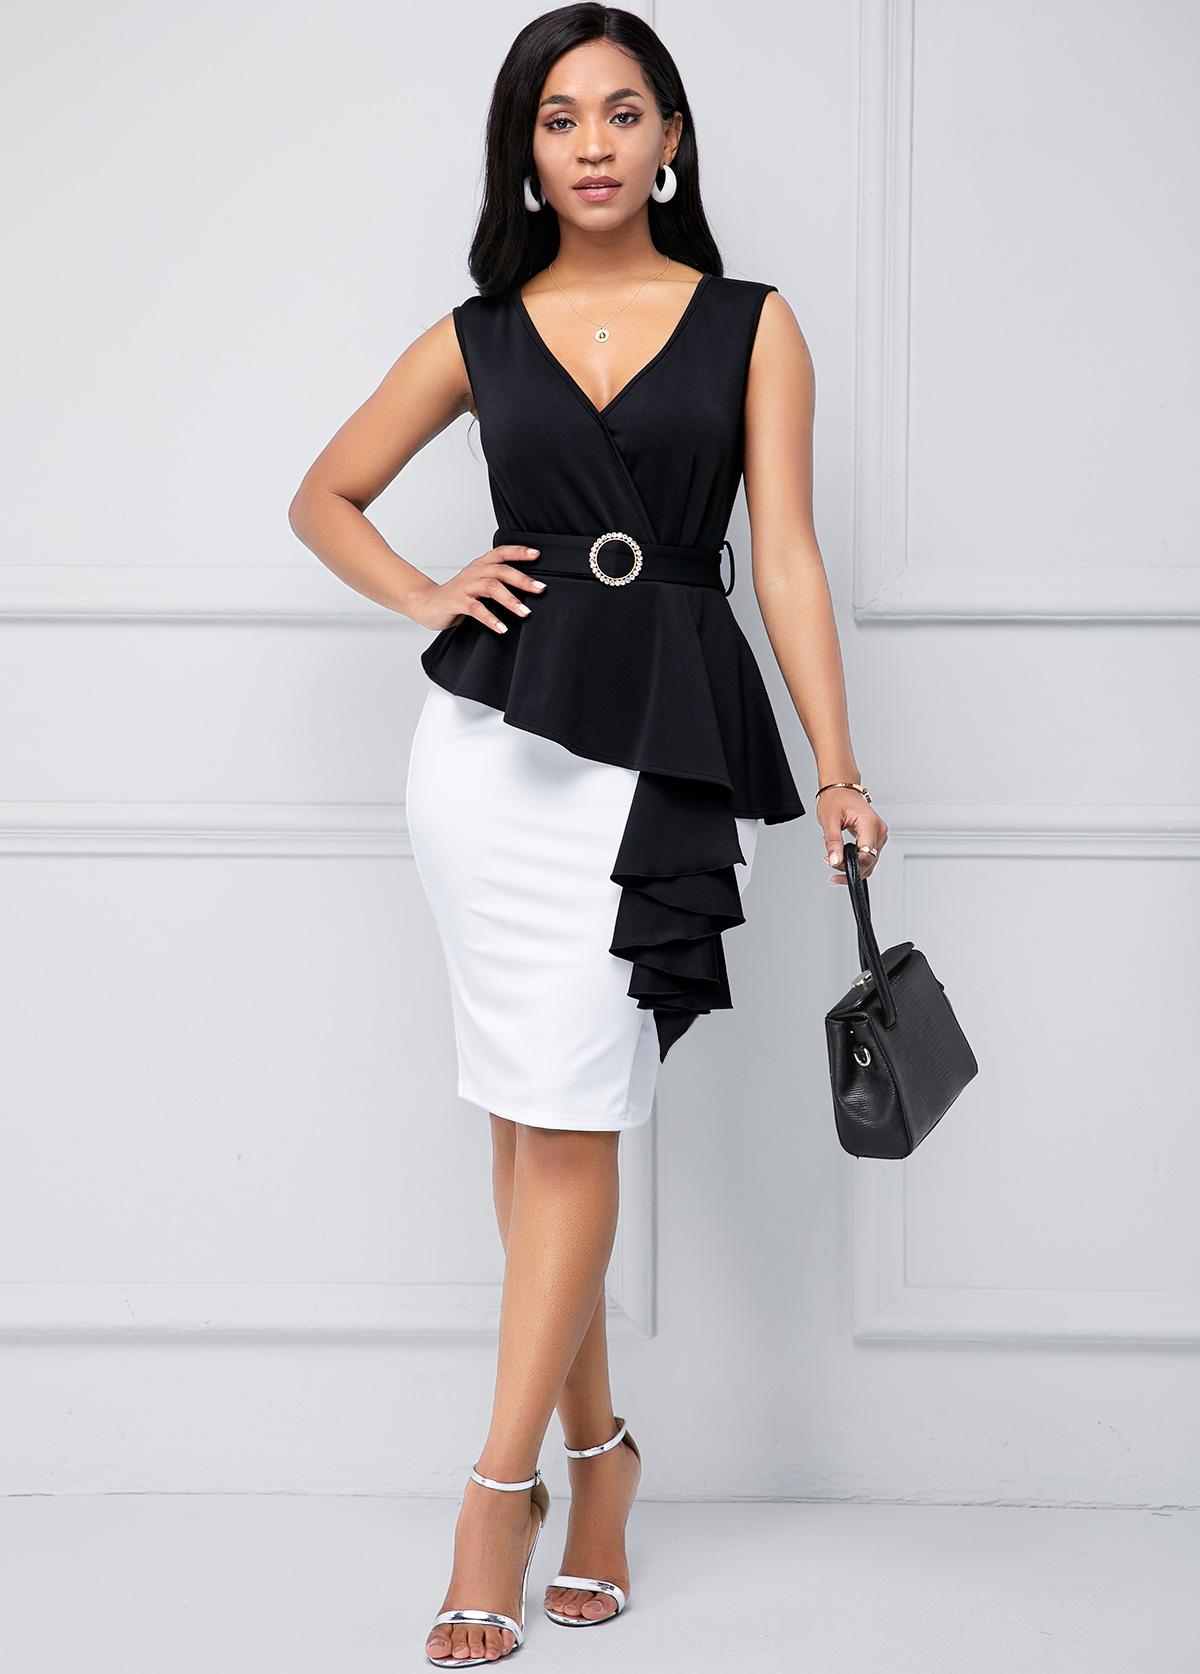 ROTITA Peplum Waist Belted Color Block Dress